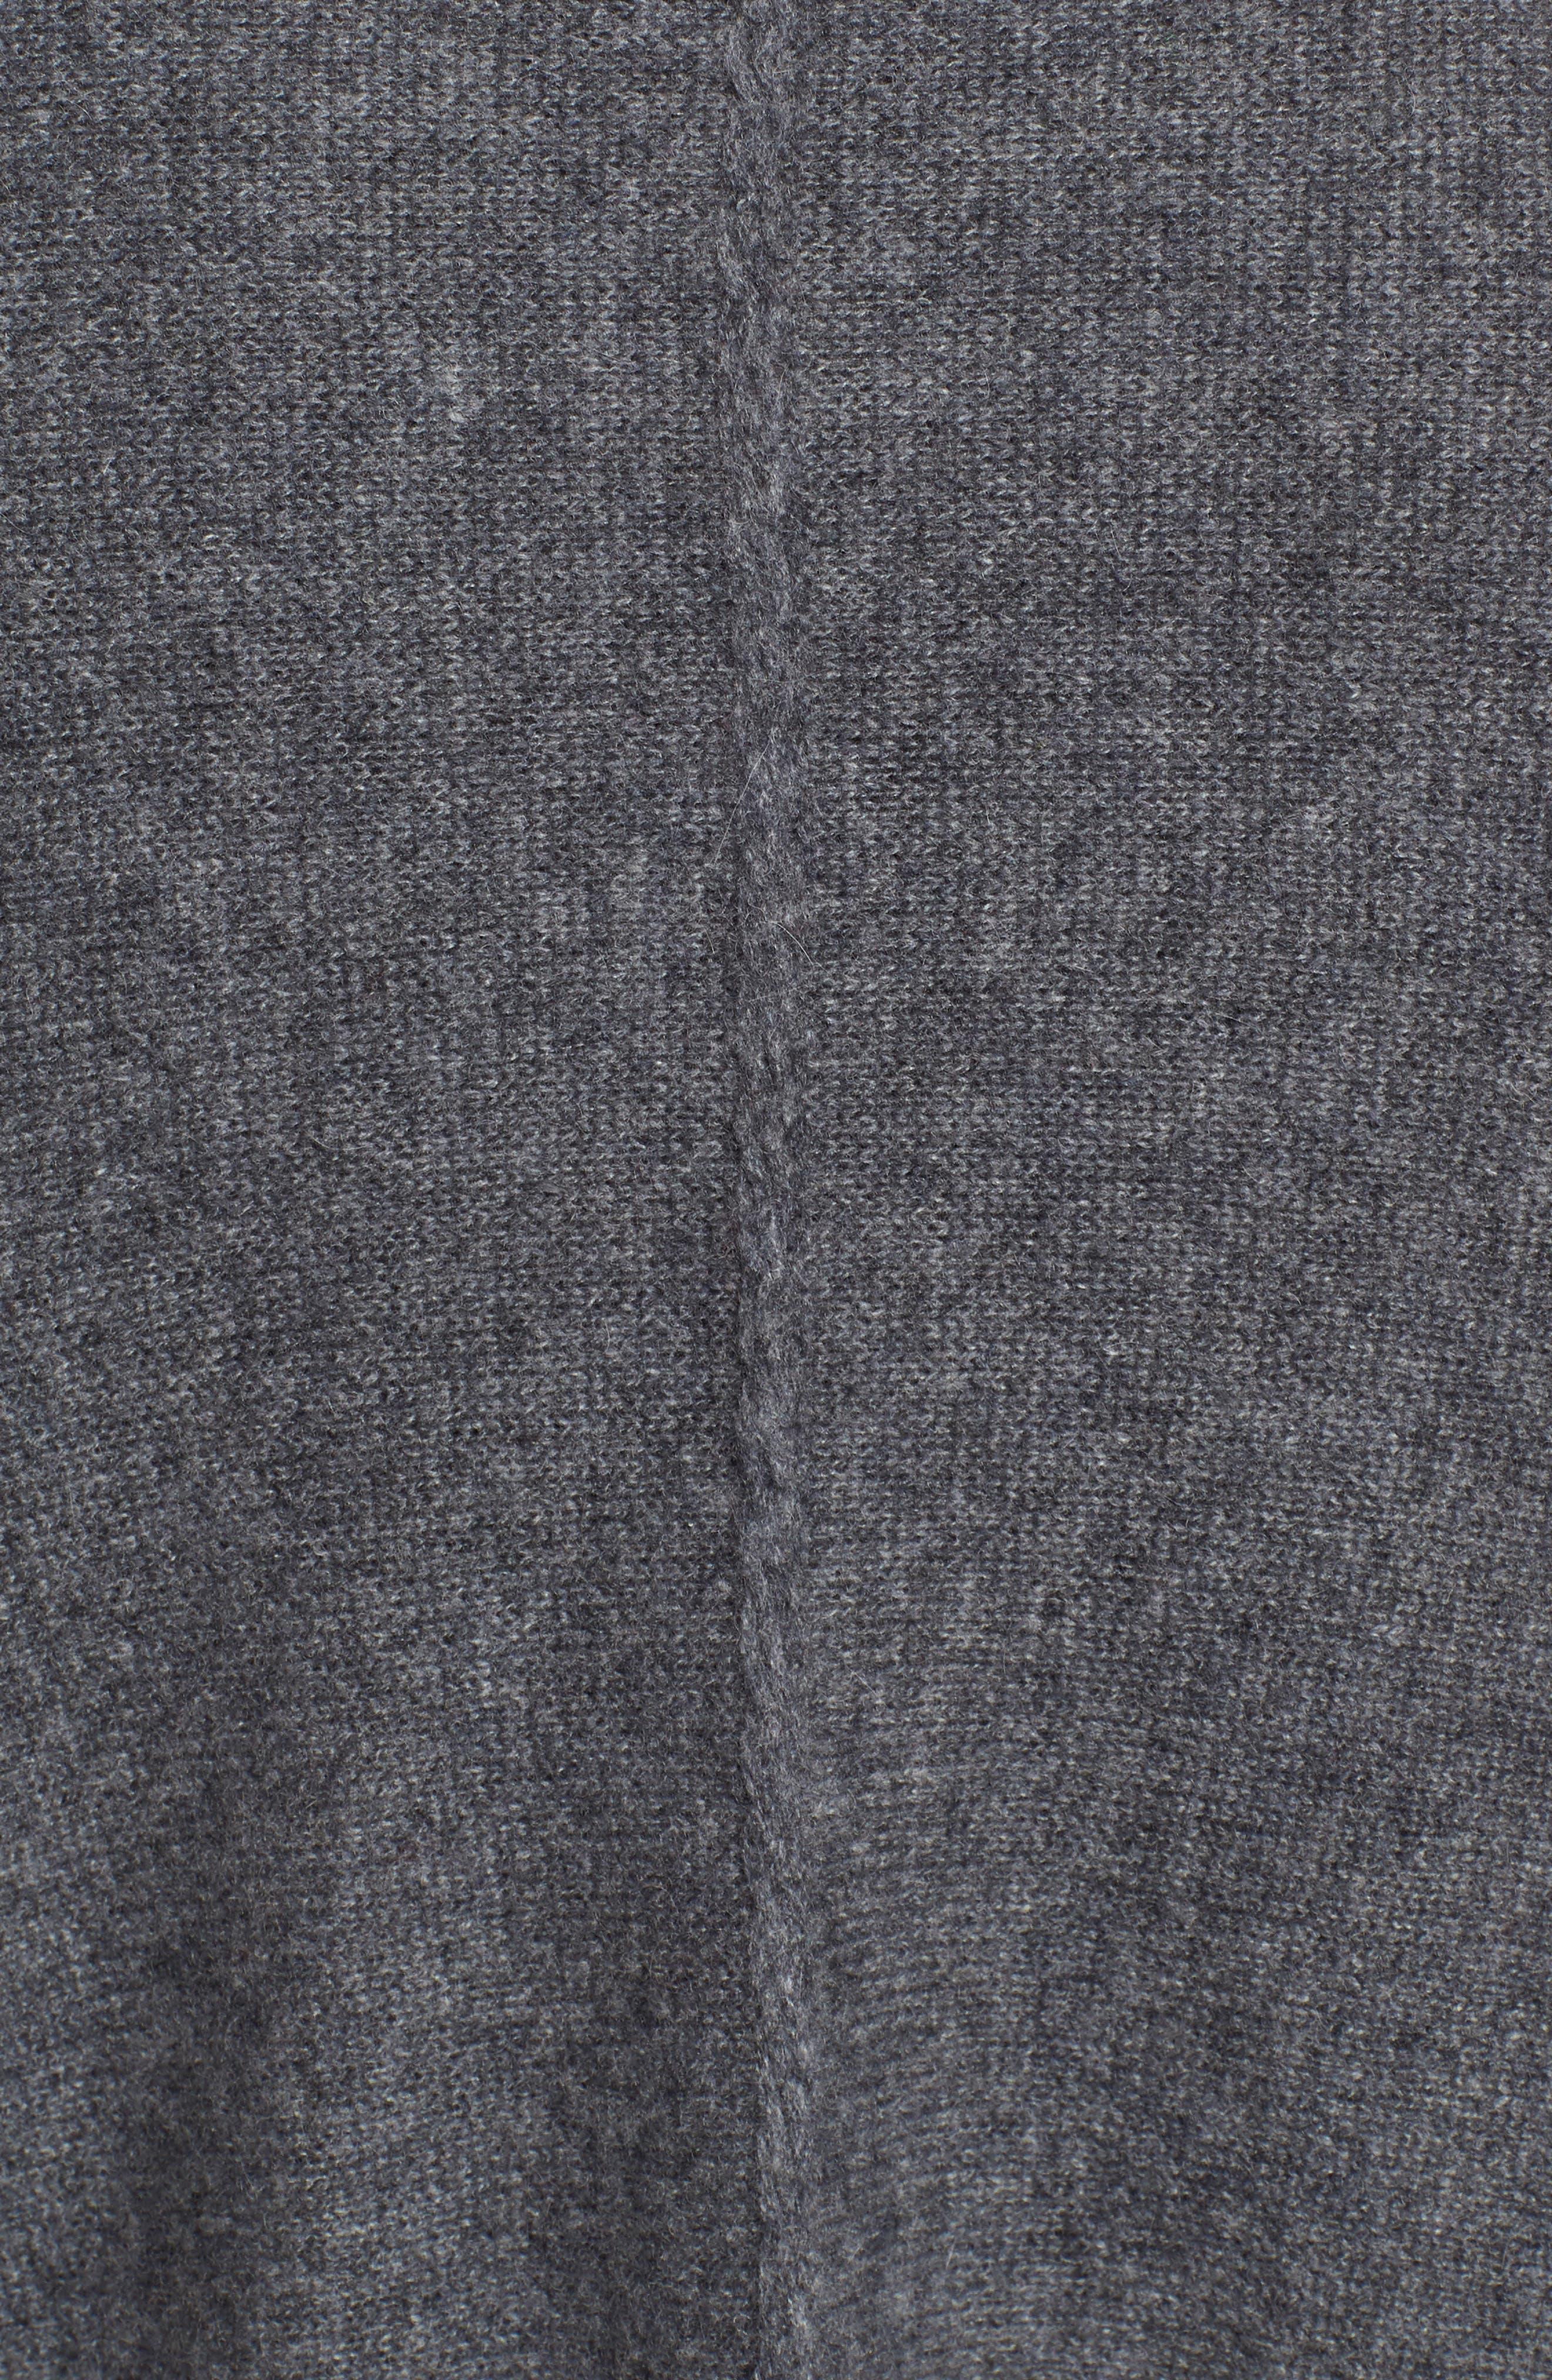 Cashmere Wrap,                             Alternate thumbnail 5, color,                             GREY DARK HEATHER